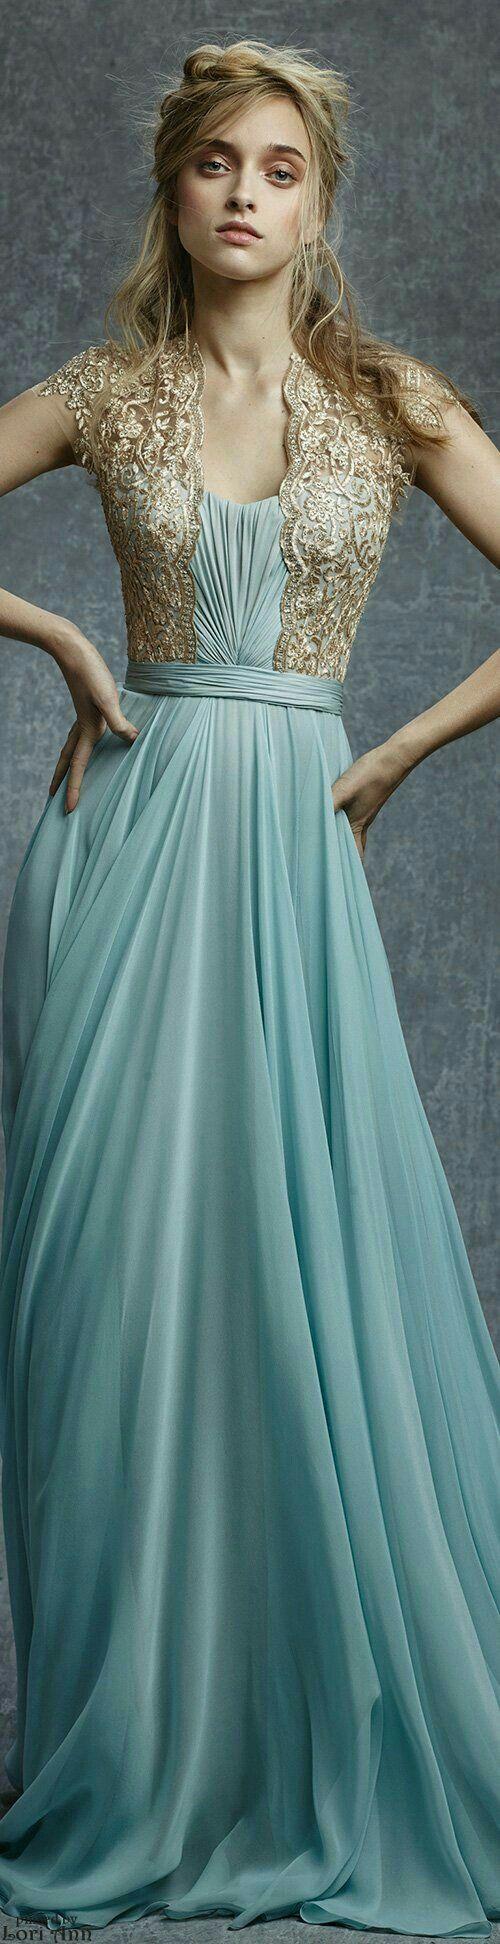 13 best Client Board images on Pinterest | 2 piece bridesmaid dress ...